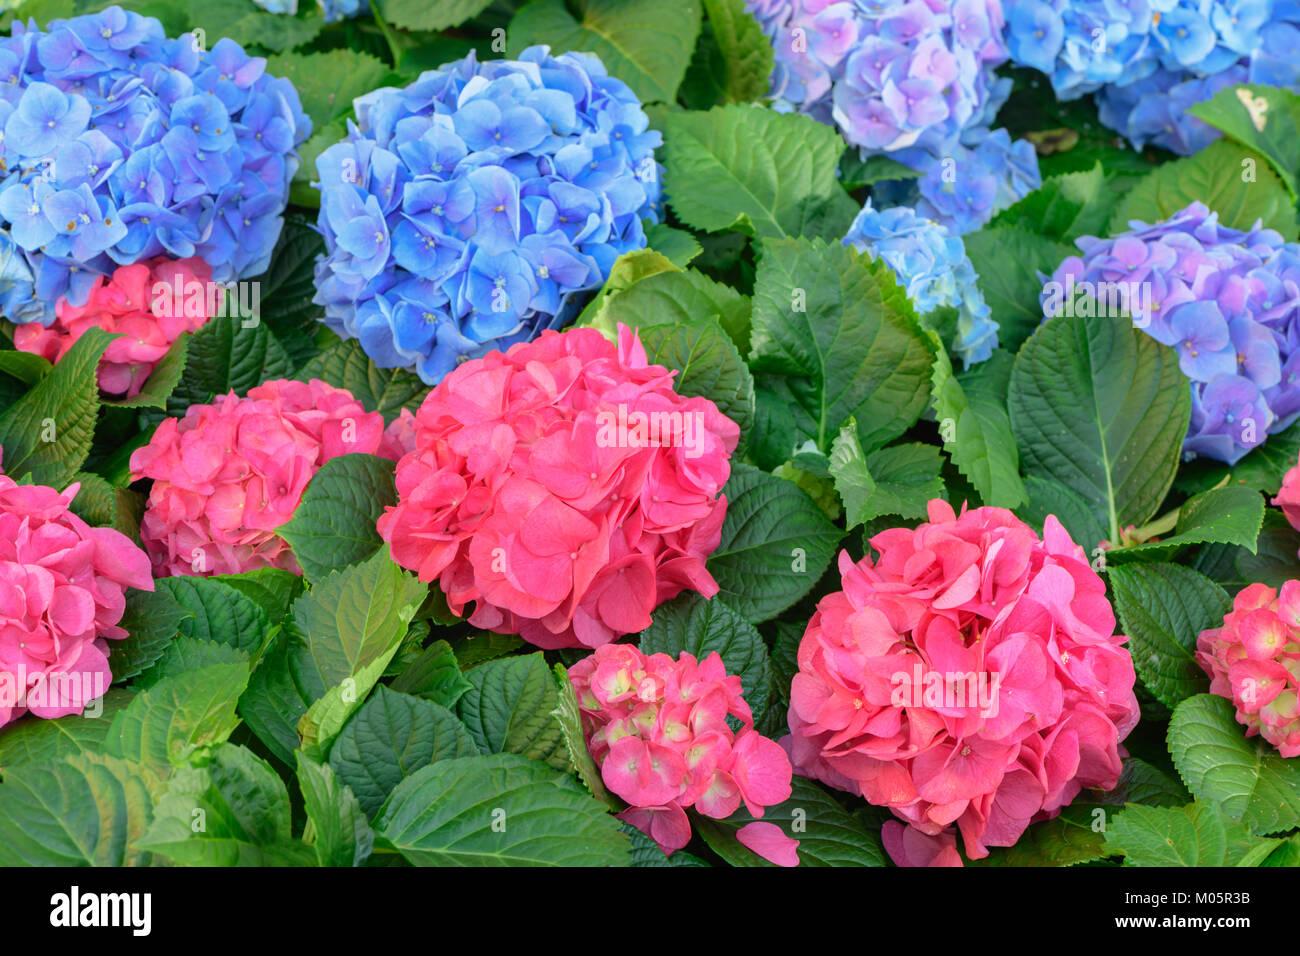 Pink And Blue Hydrangea Flower Hydrangea Macrophylla In A Garden